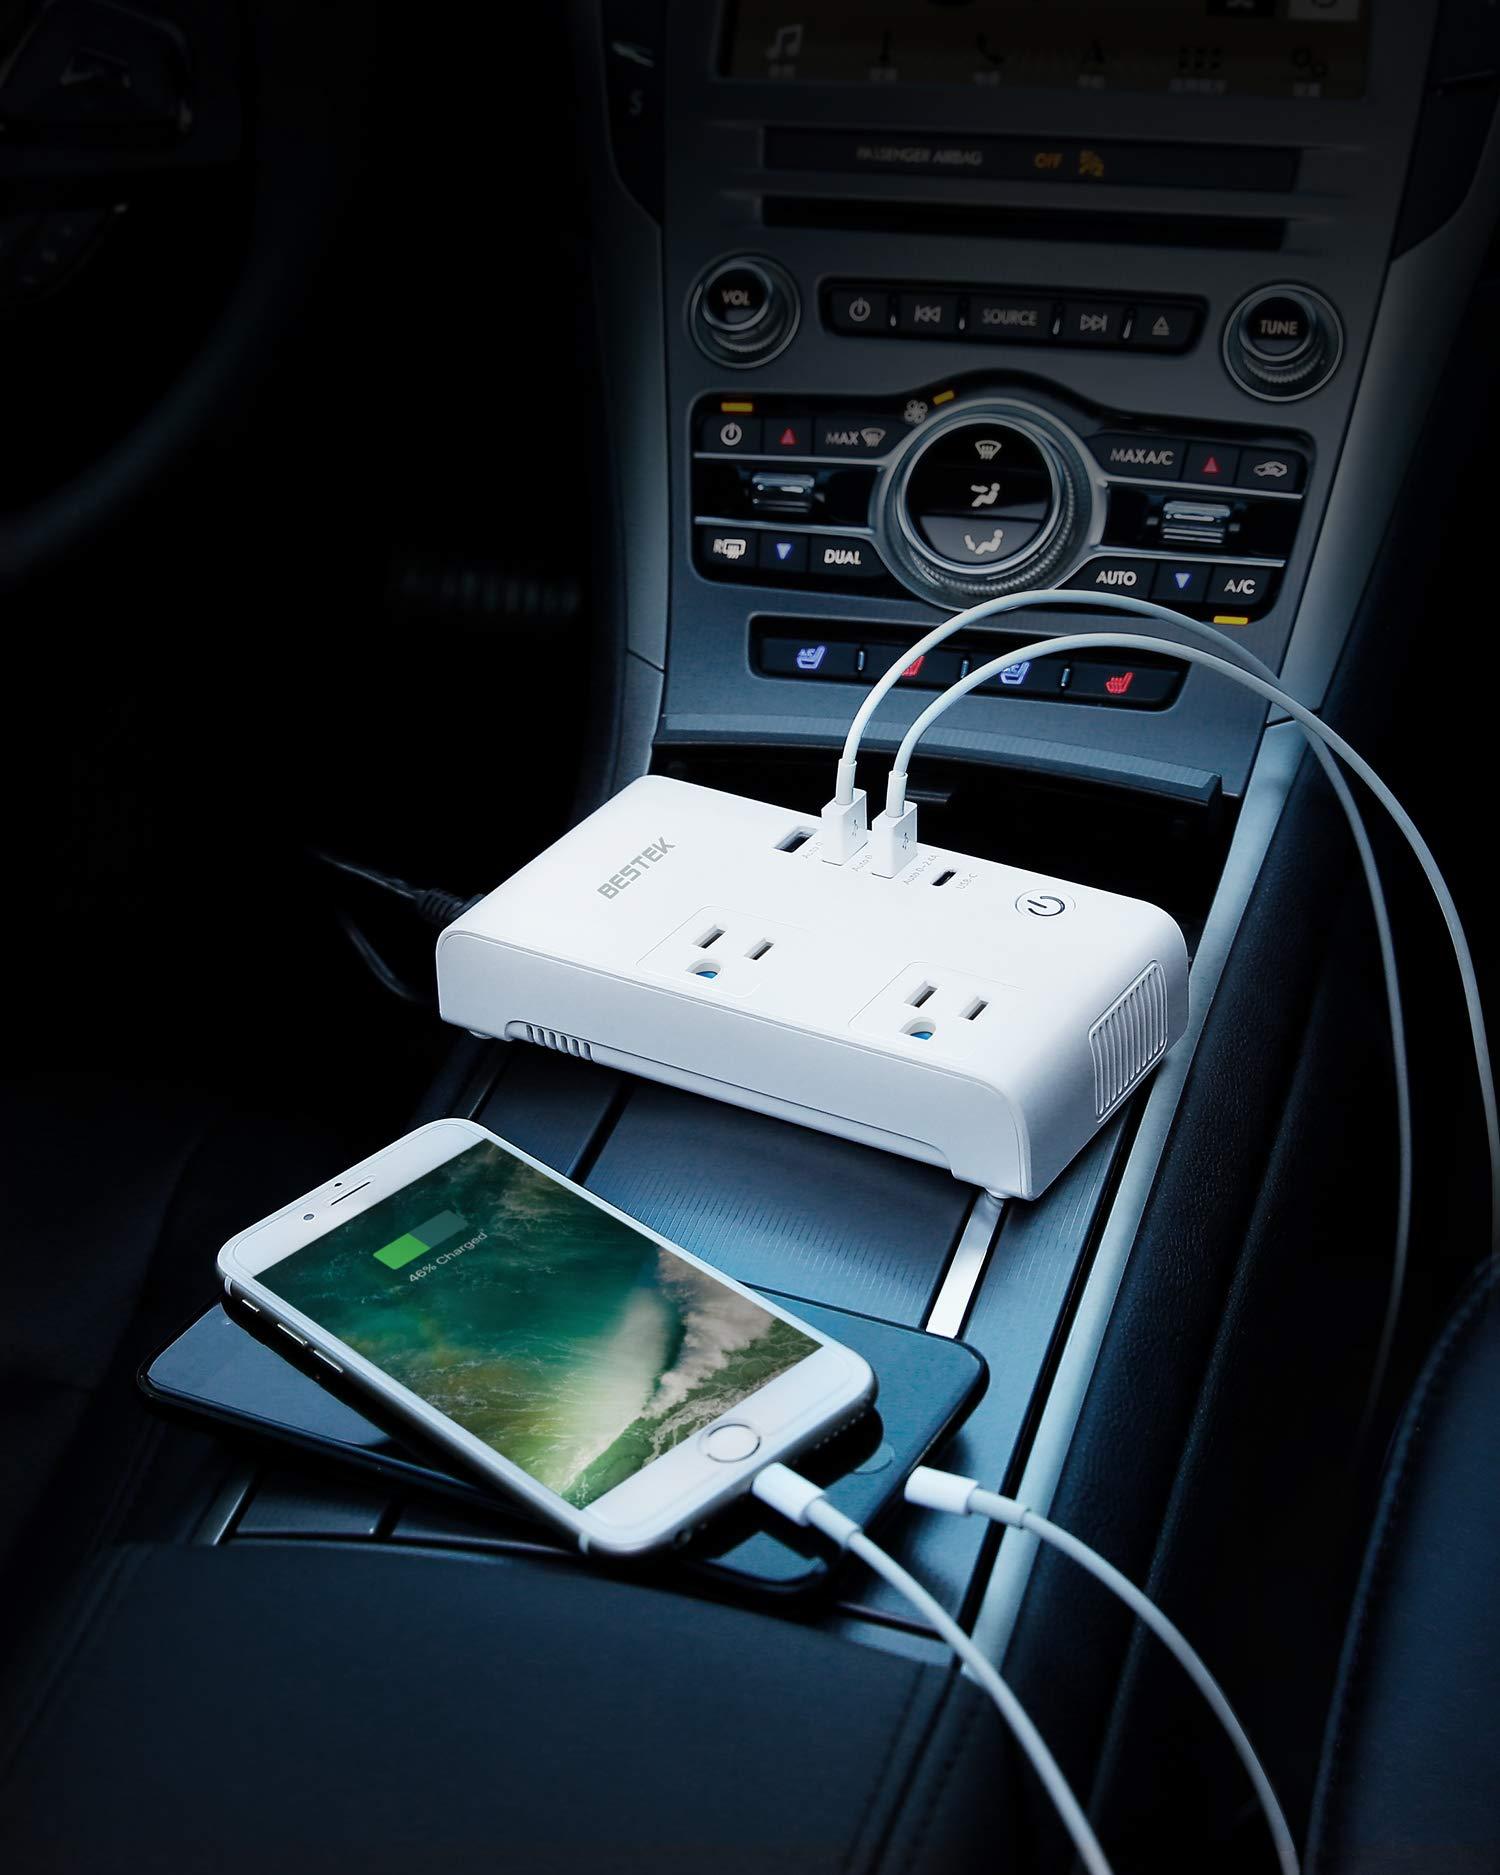 BESTEK 200W Car Power Inverter DC 12V to AC 110V Converter with 7.8A 4 USB Car Charger (1 USB-C Port, ETL Listed) Ultra Quiet by BESTEK (Image #6)